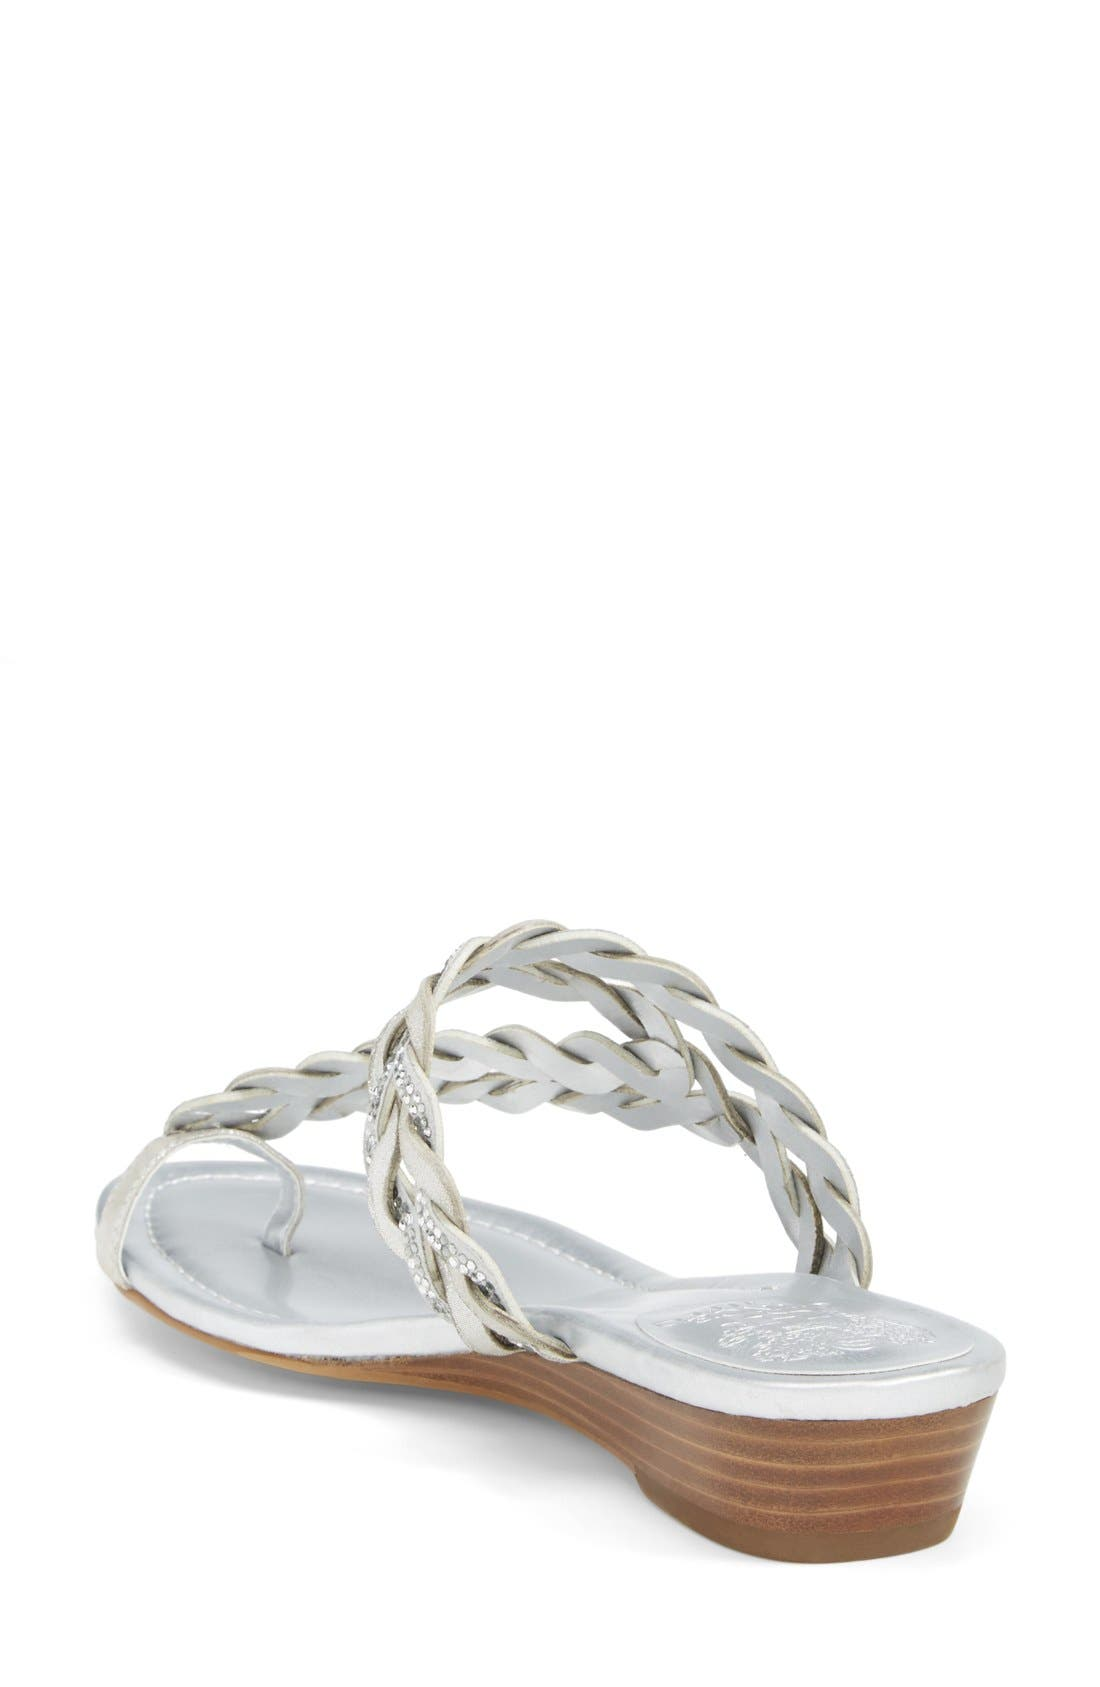 Alternate Image 2  - Vince Camuto 'Imora' Braided Thong Sandal (Women)